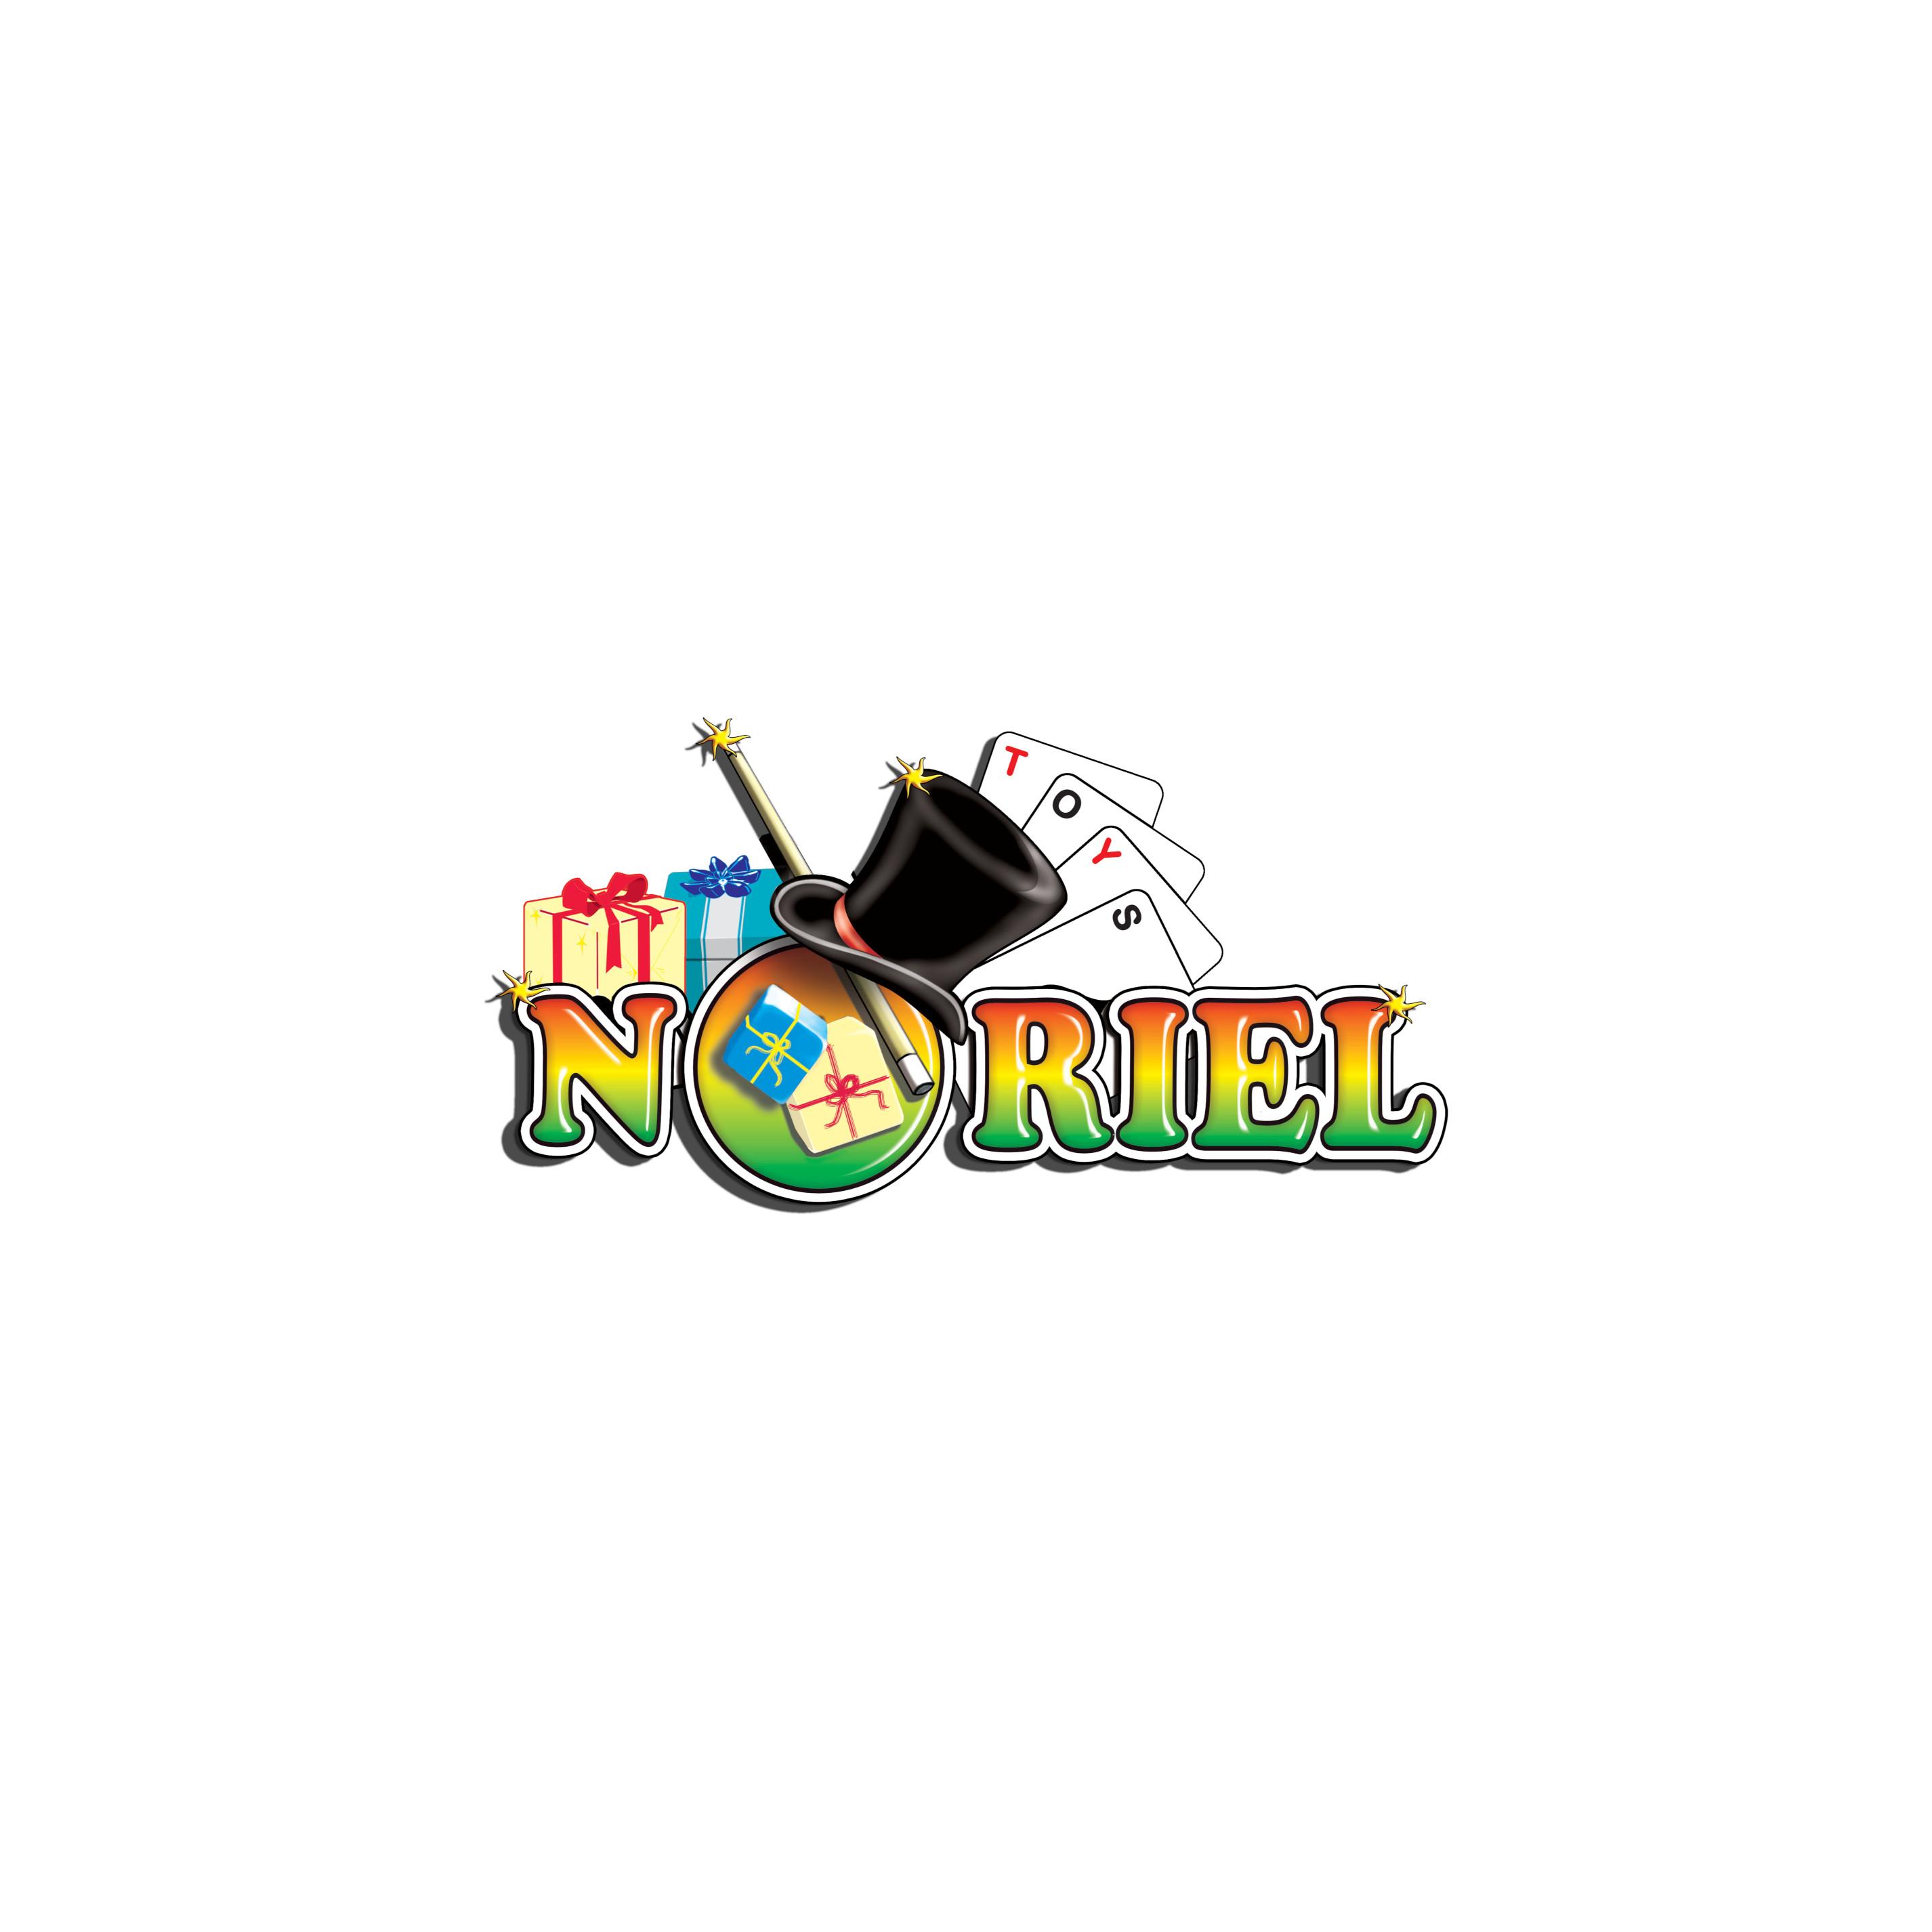 20201086_001 Ochelari de soare Disney Minnie Mouse